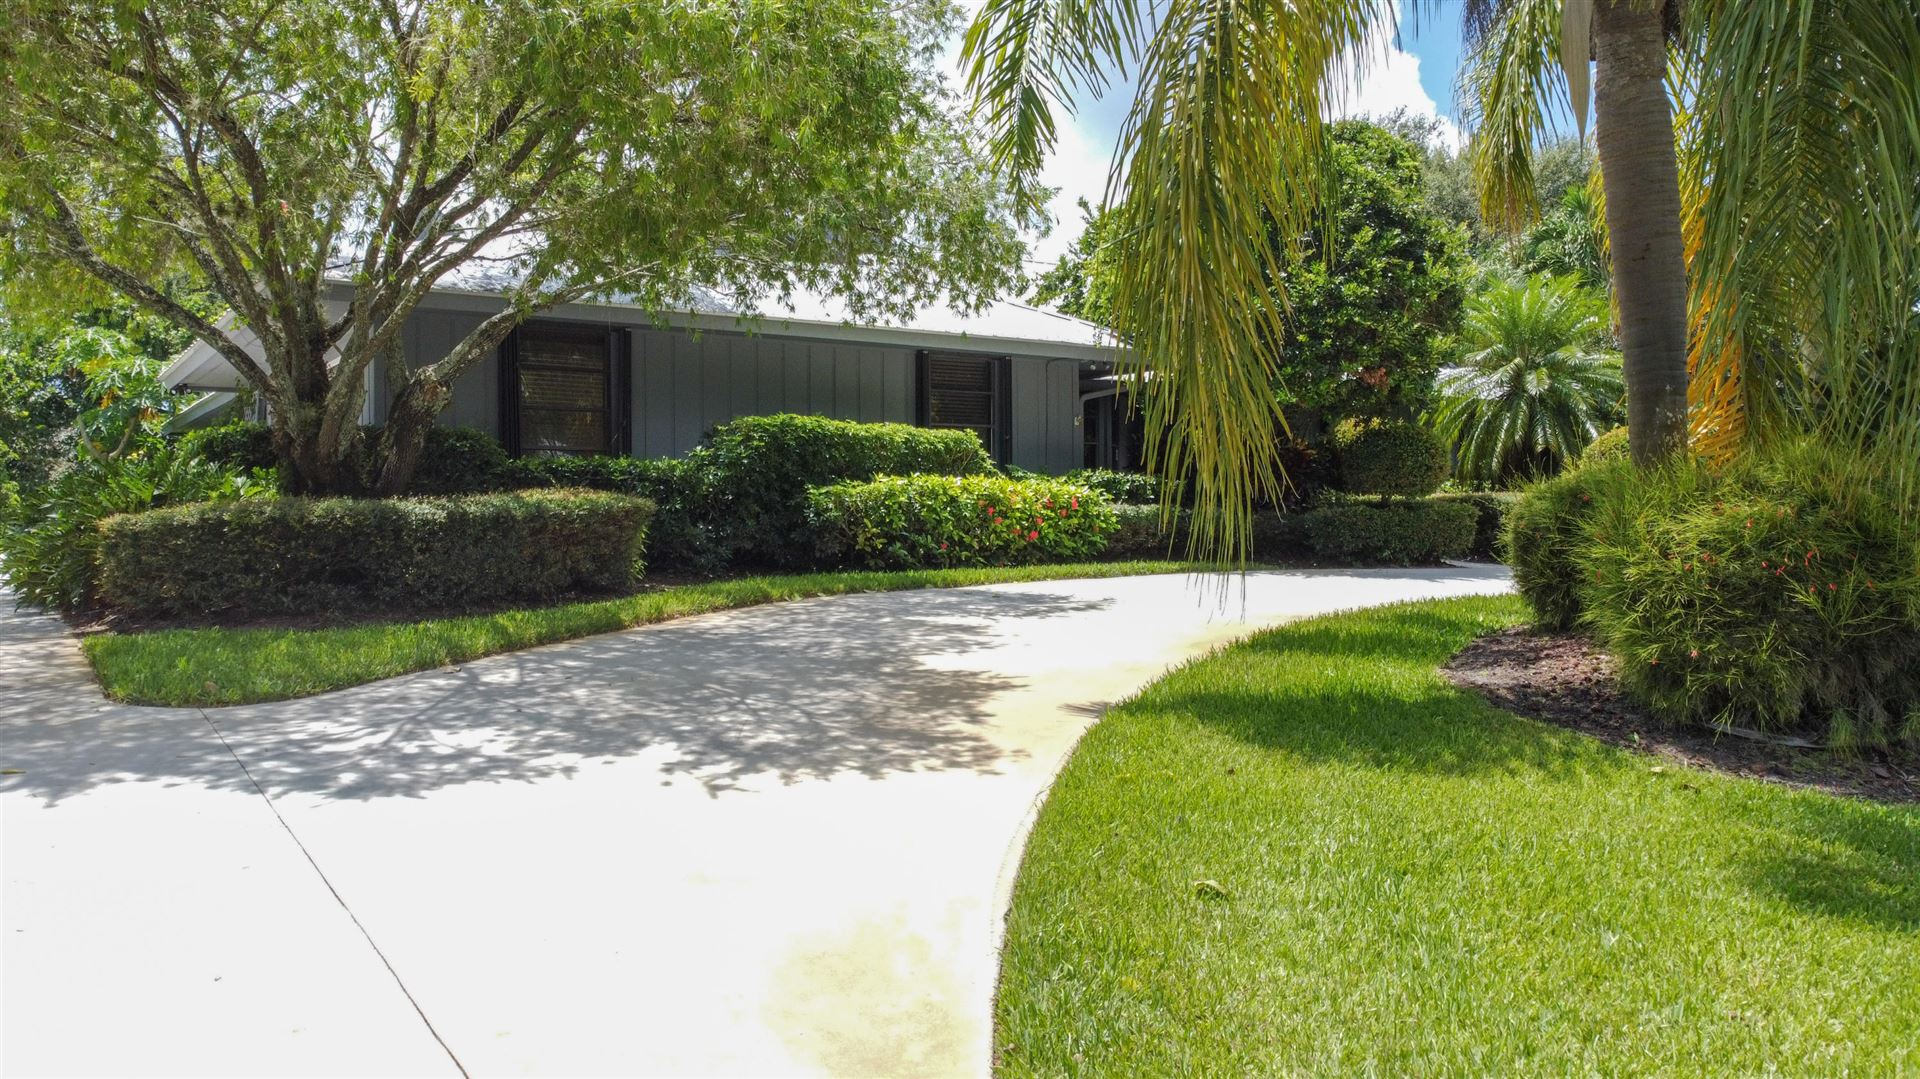 Photo of 366 NE Ficus Terrace, Jensen Beach, FL 34957 (MLS # RX-10645145)